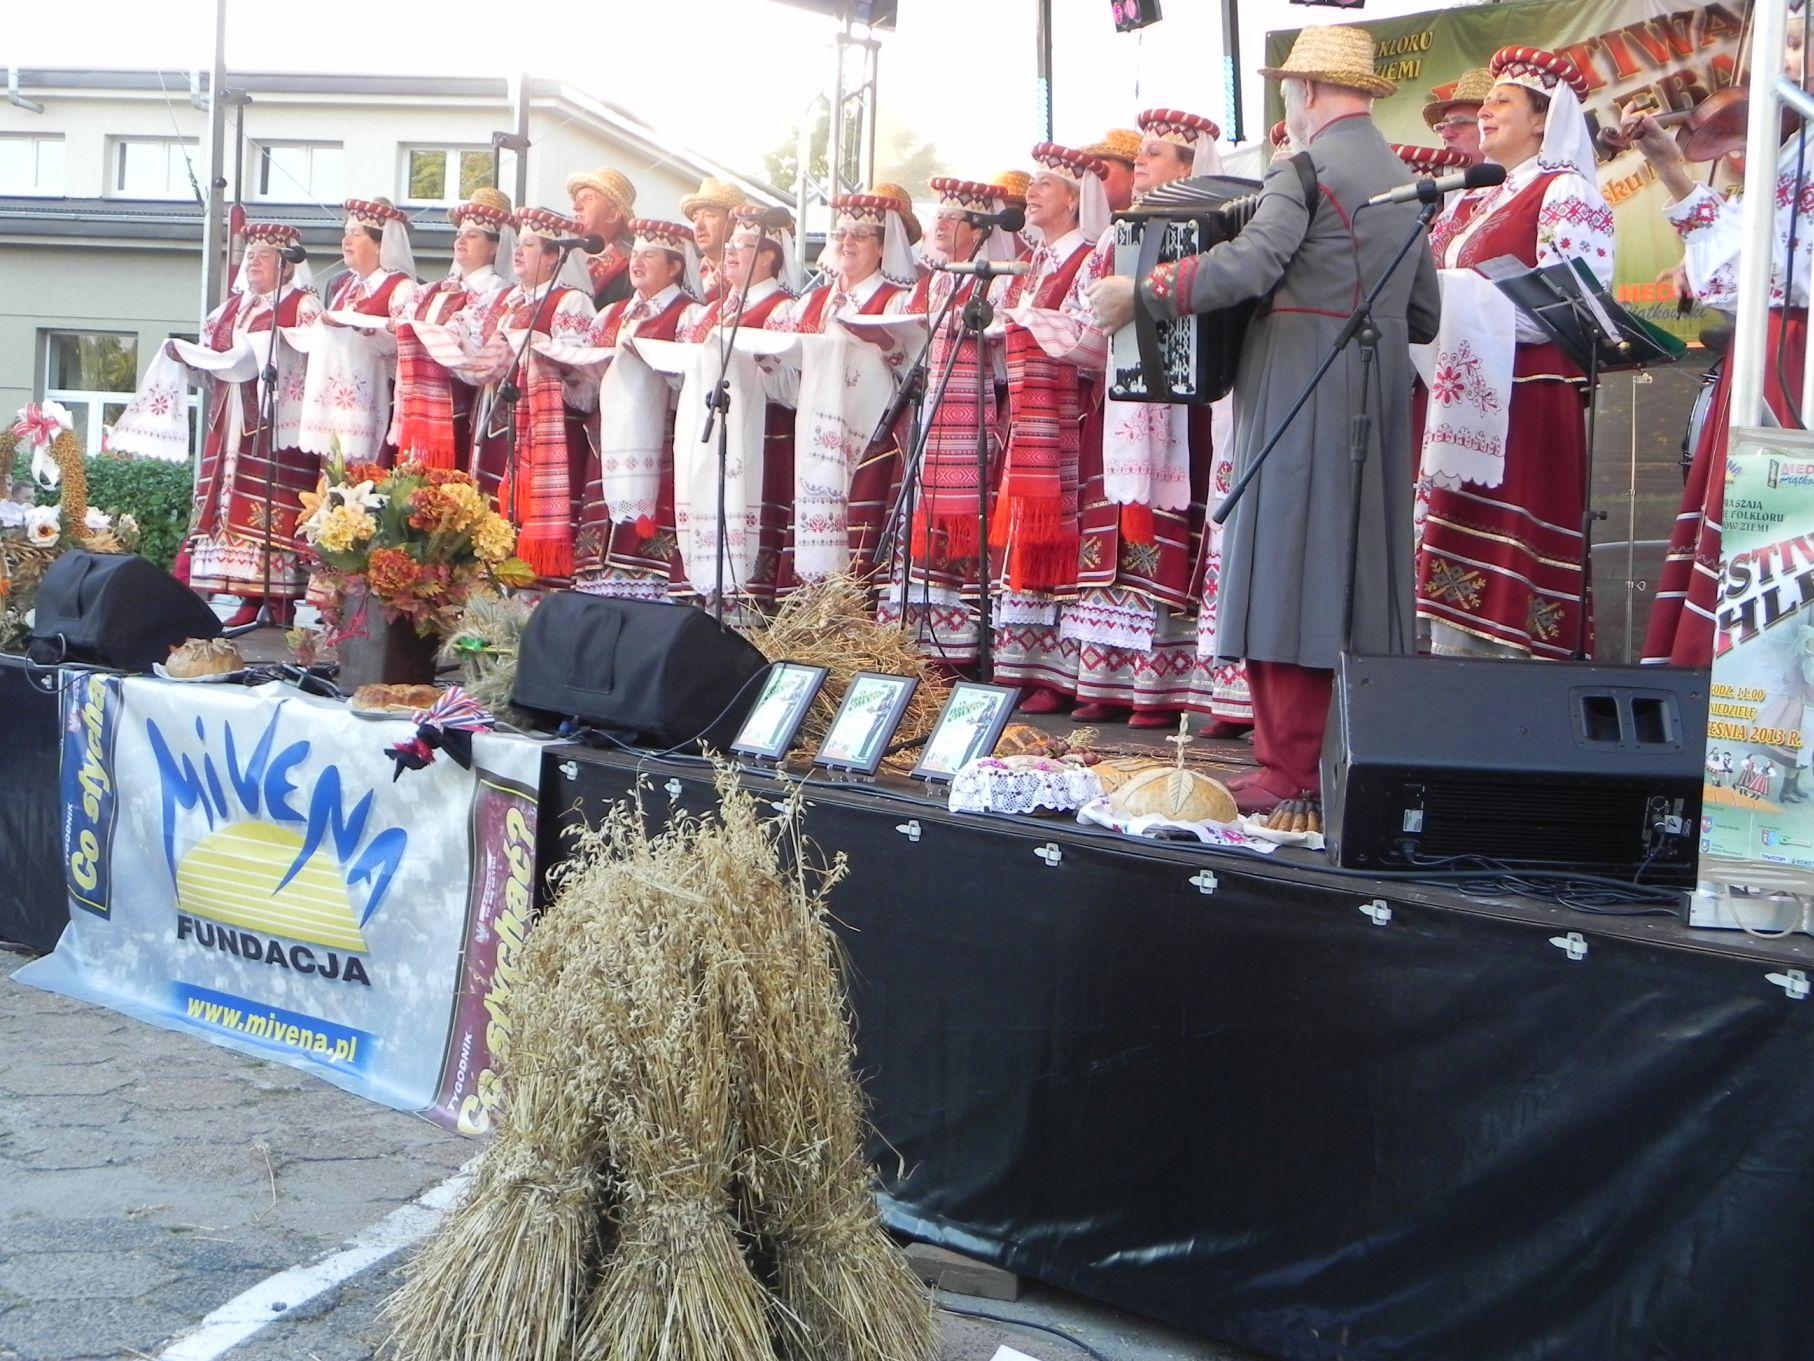 2013-09-10 Festyn - Mińsk Maz (111)